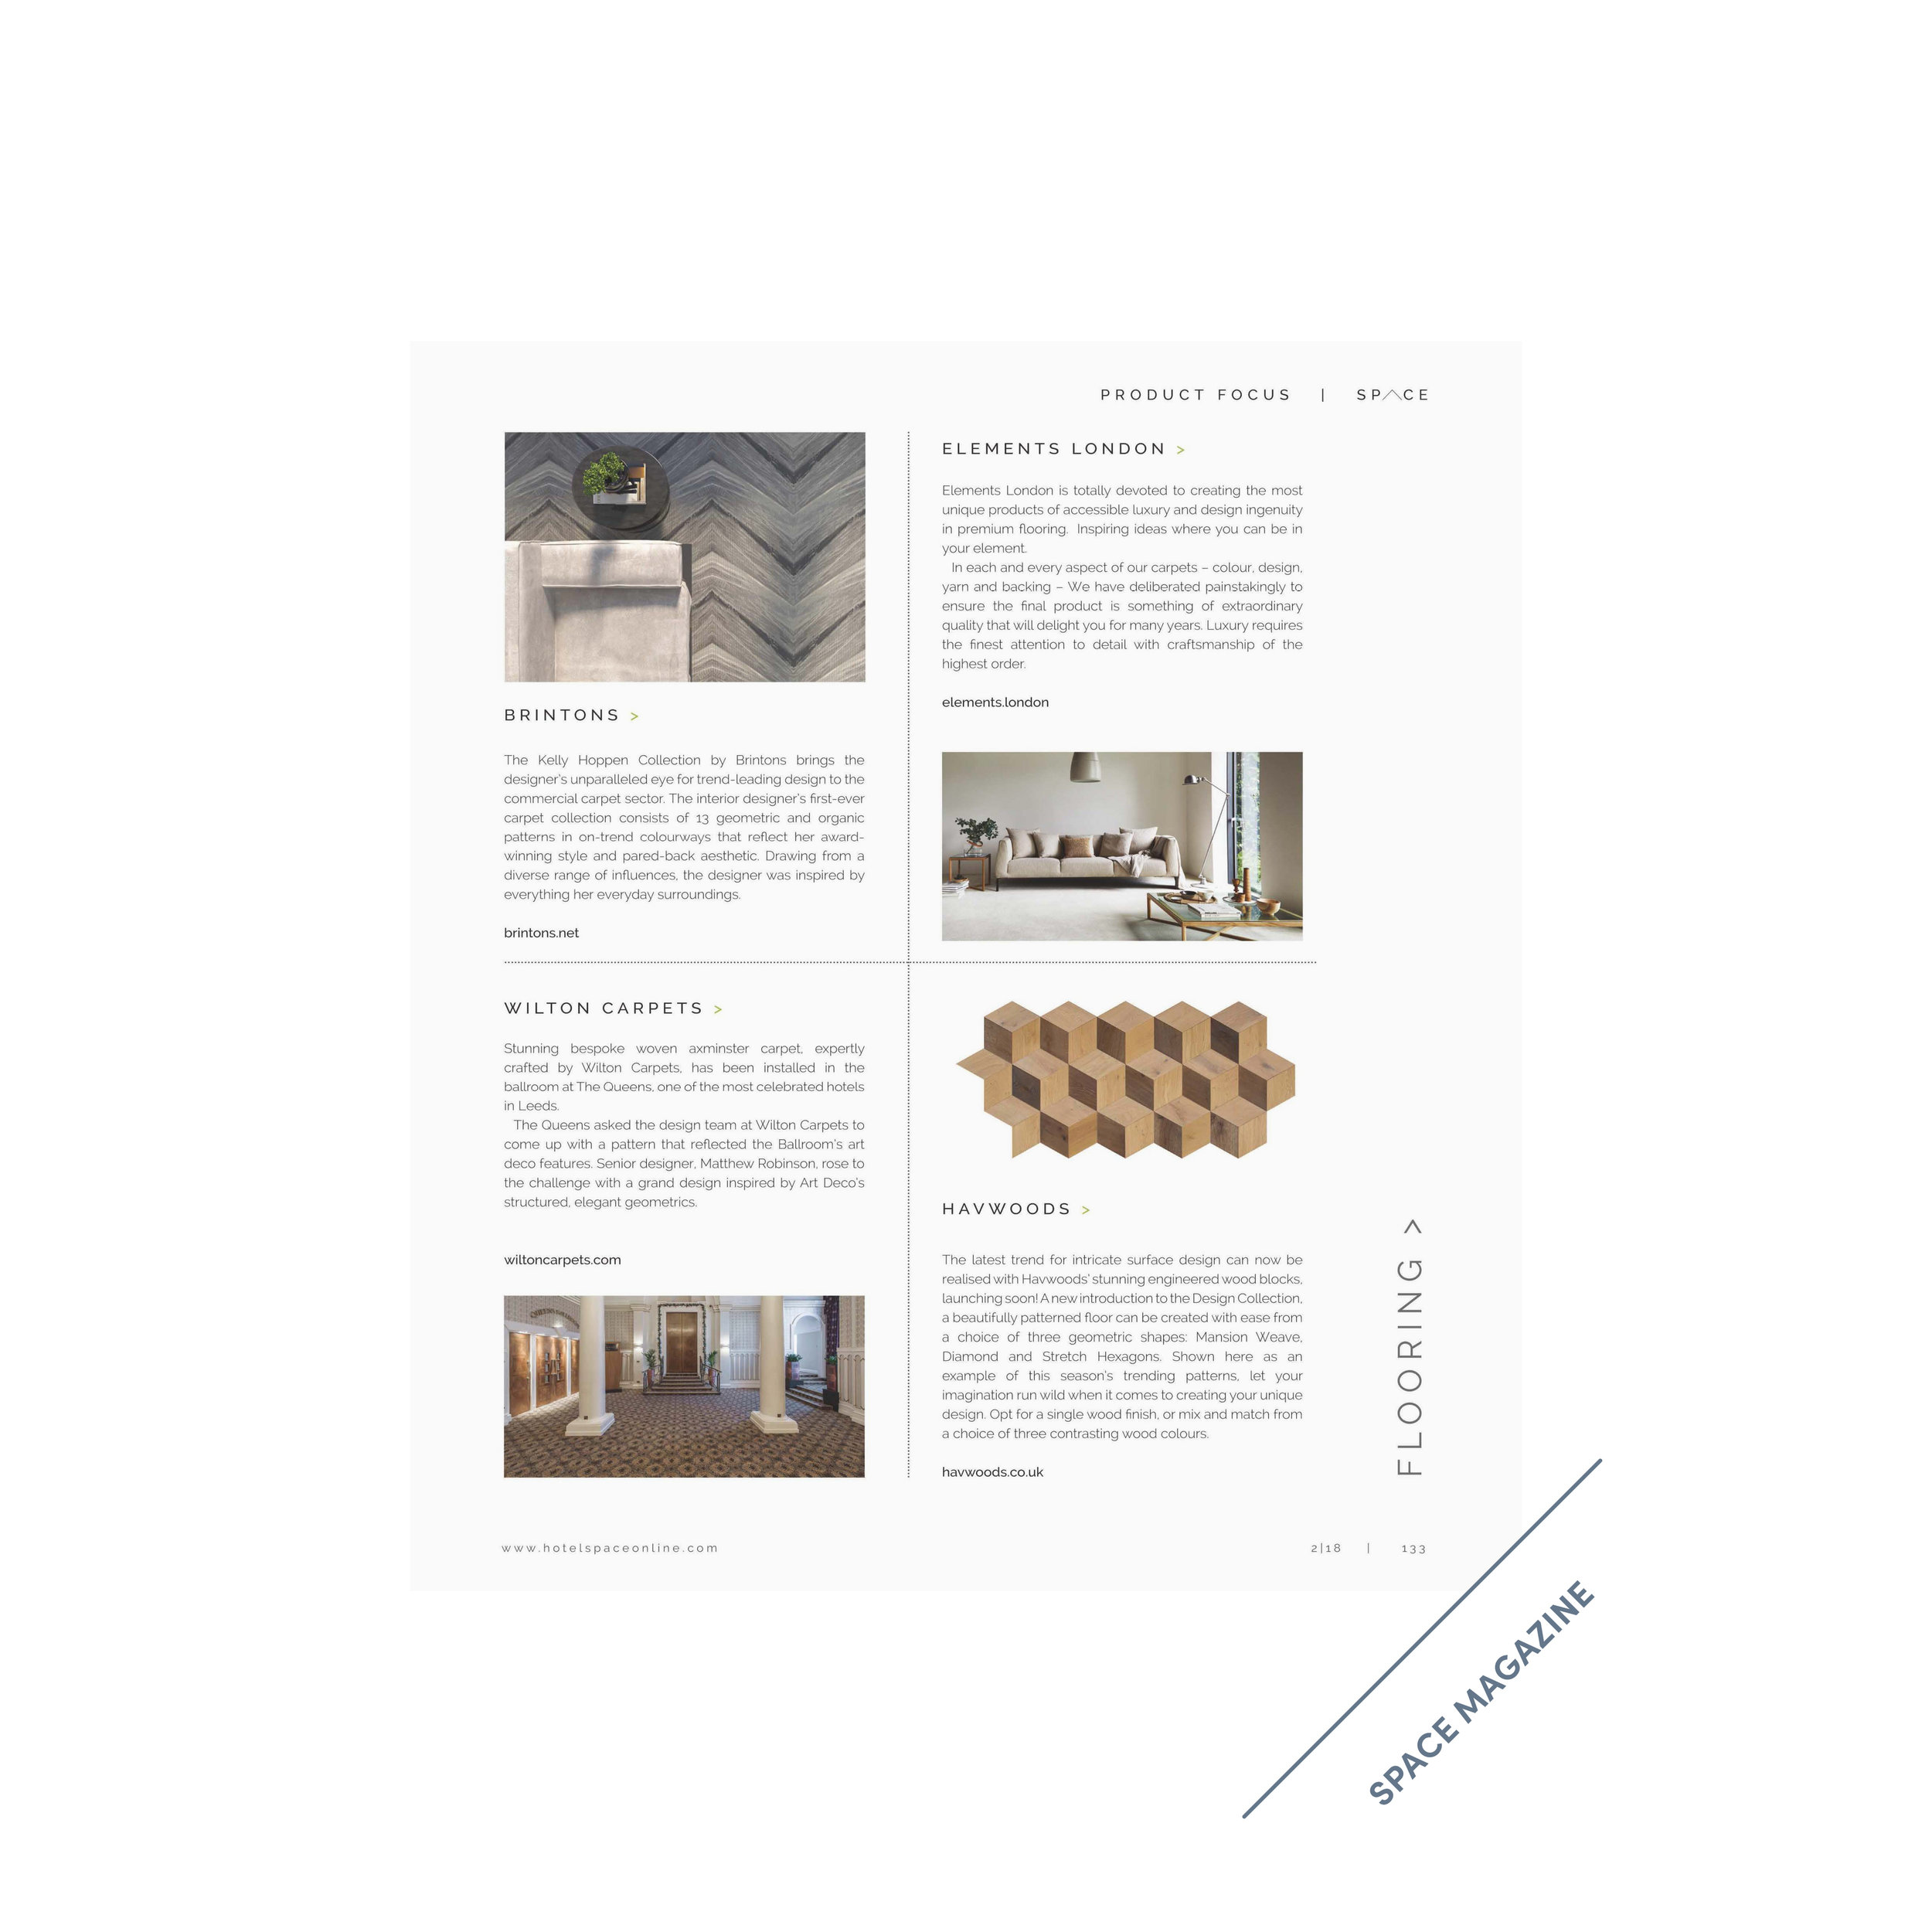 ITWR_interiors PR_Trade_7.jpg